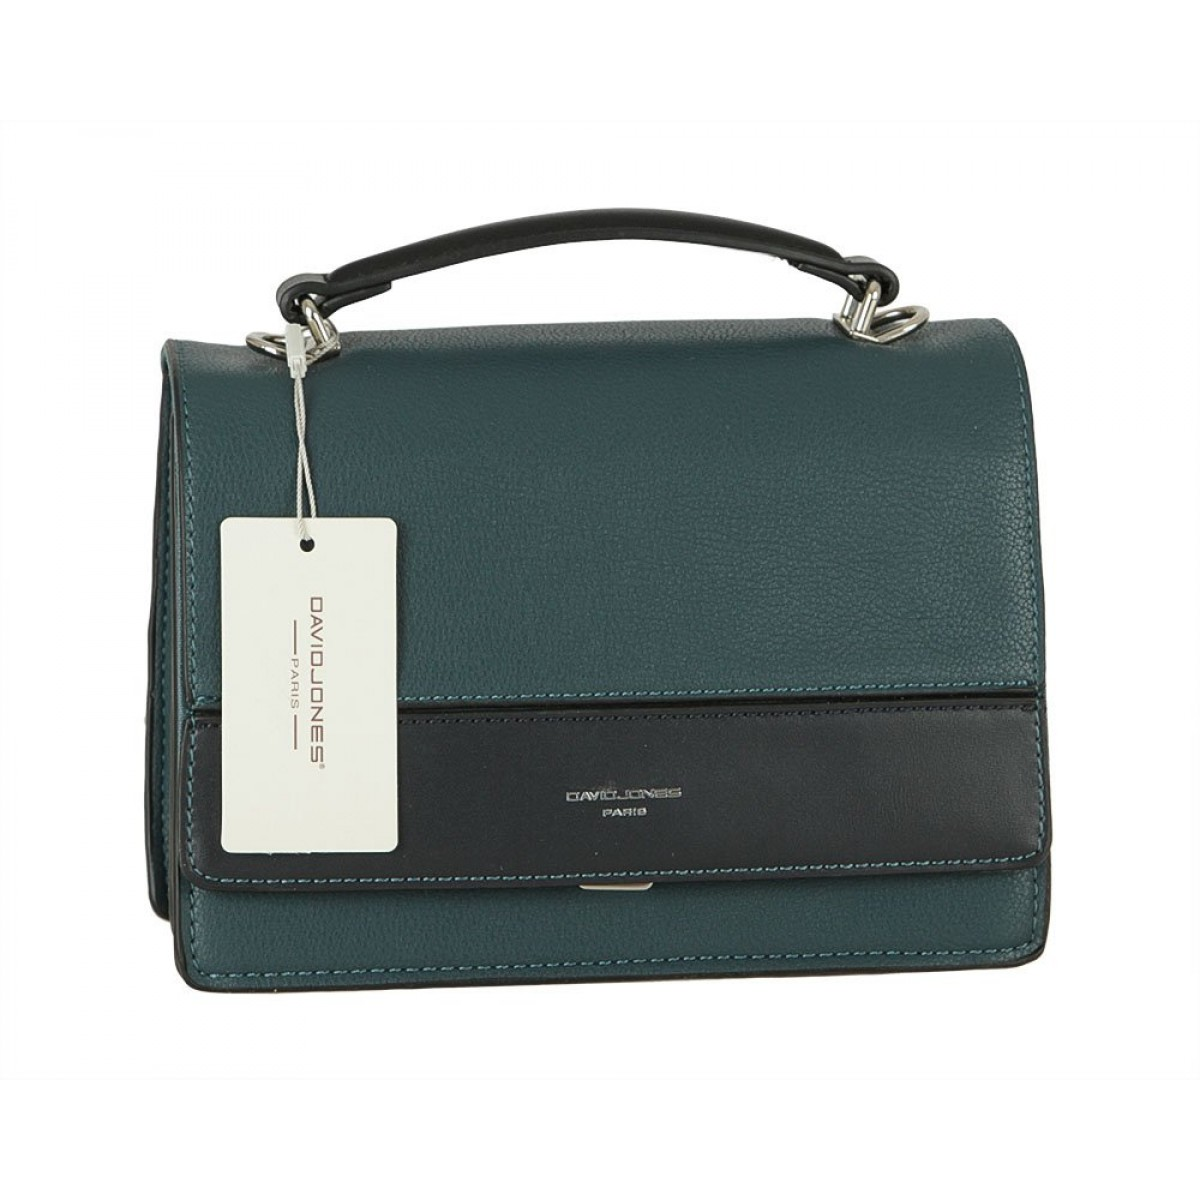 Жіноча сумка David Jones 6413-1 PEACOCK BLUE